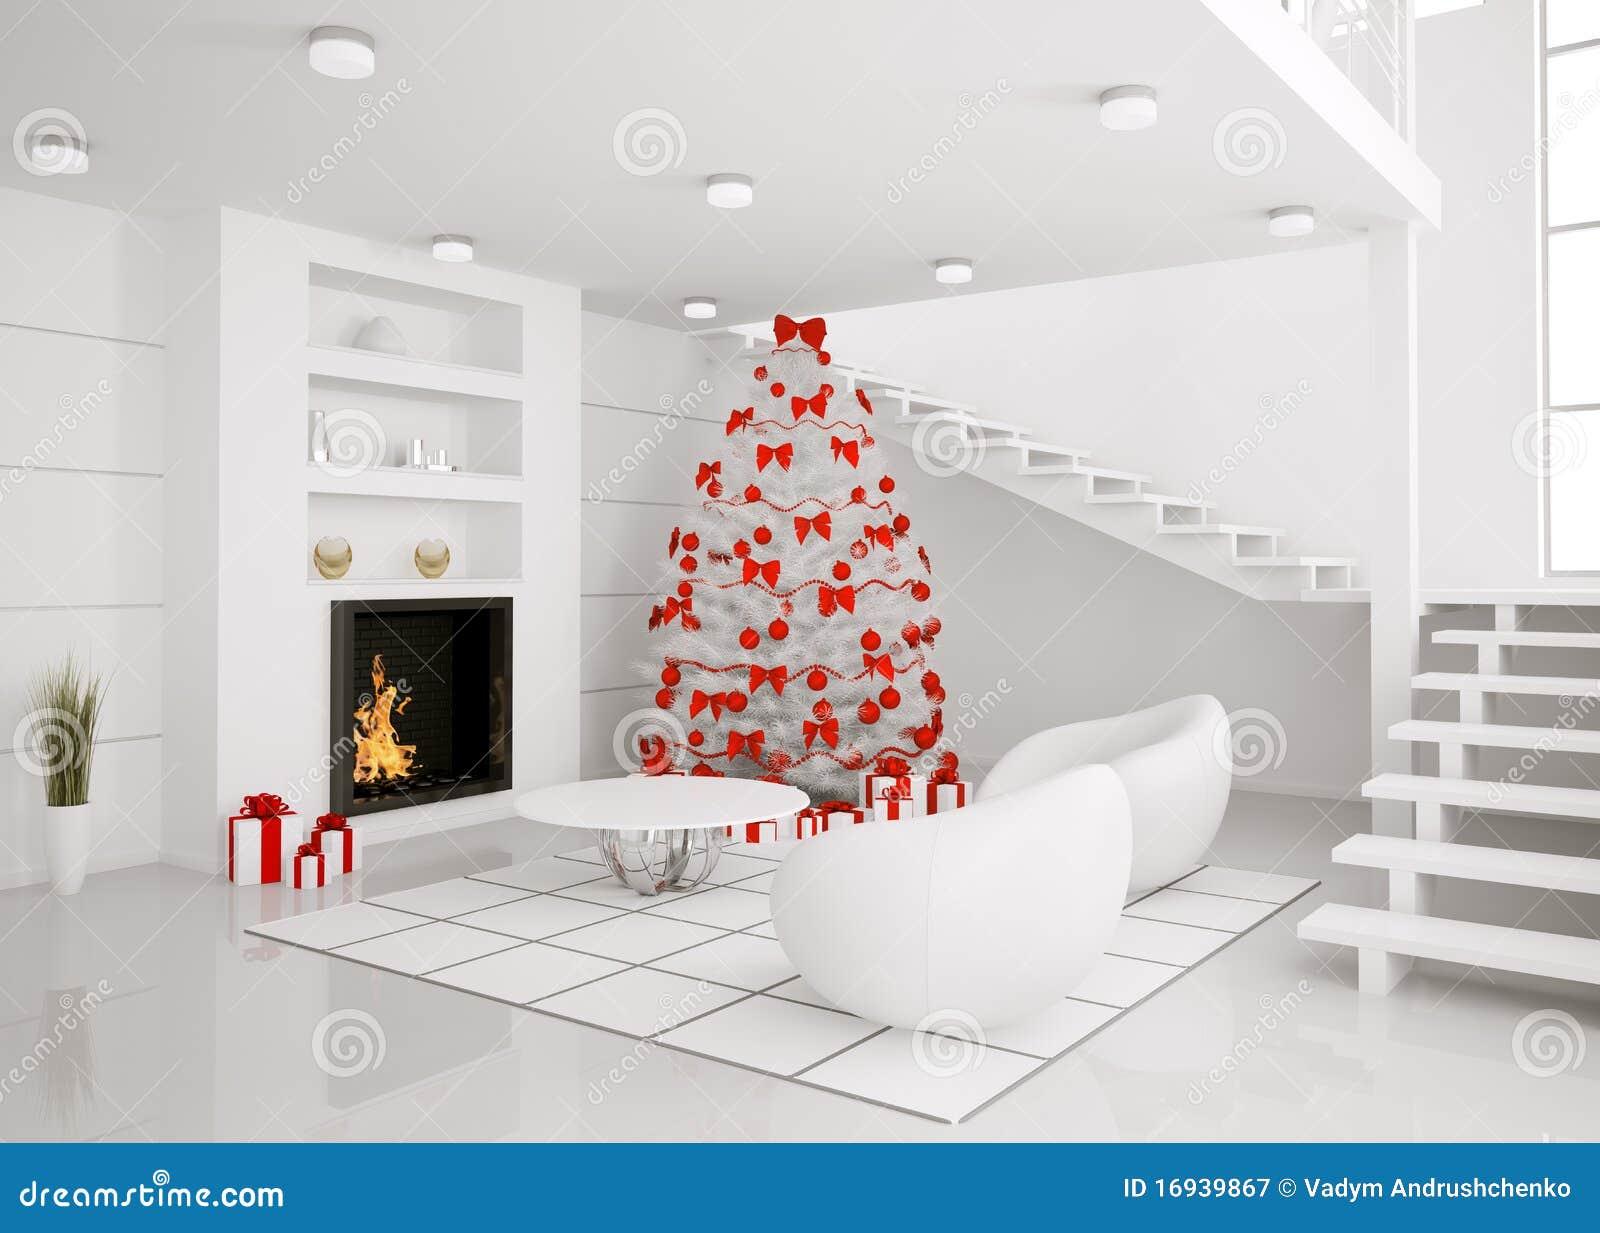 L 39 albero di natale nell 39 interiore moderno 3d rende - Arboles navidad modernos ...